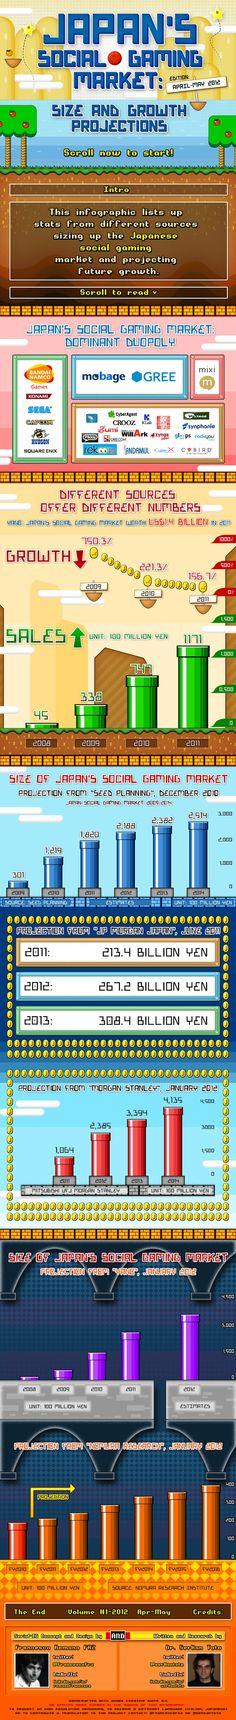 Japan's Social Gaming Market